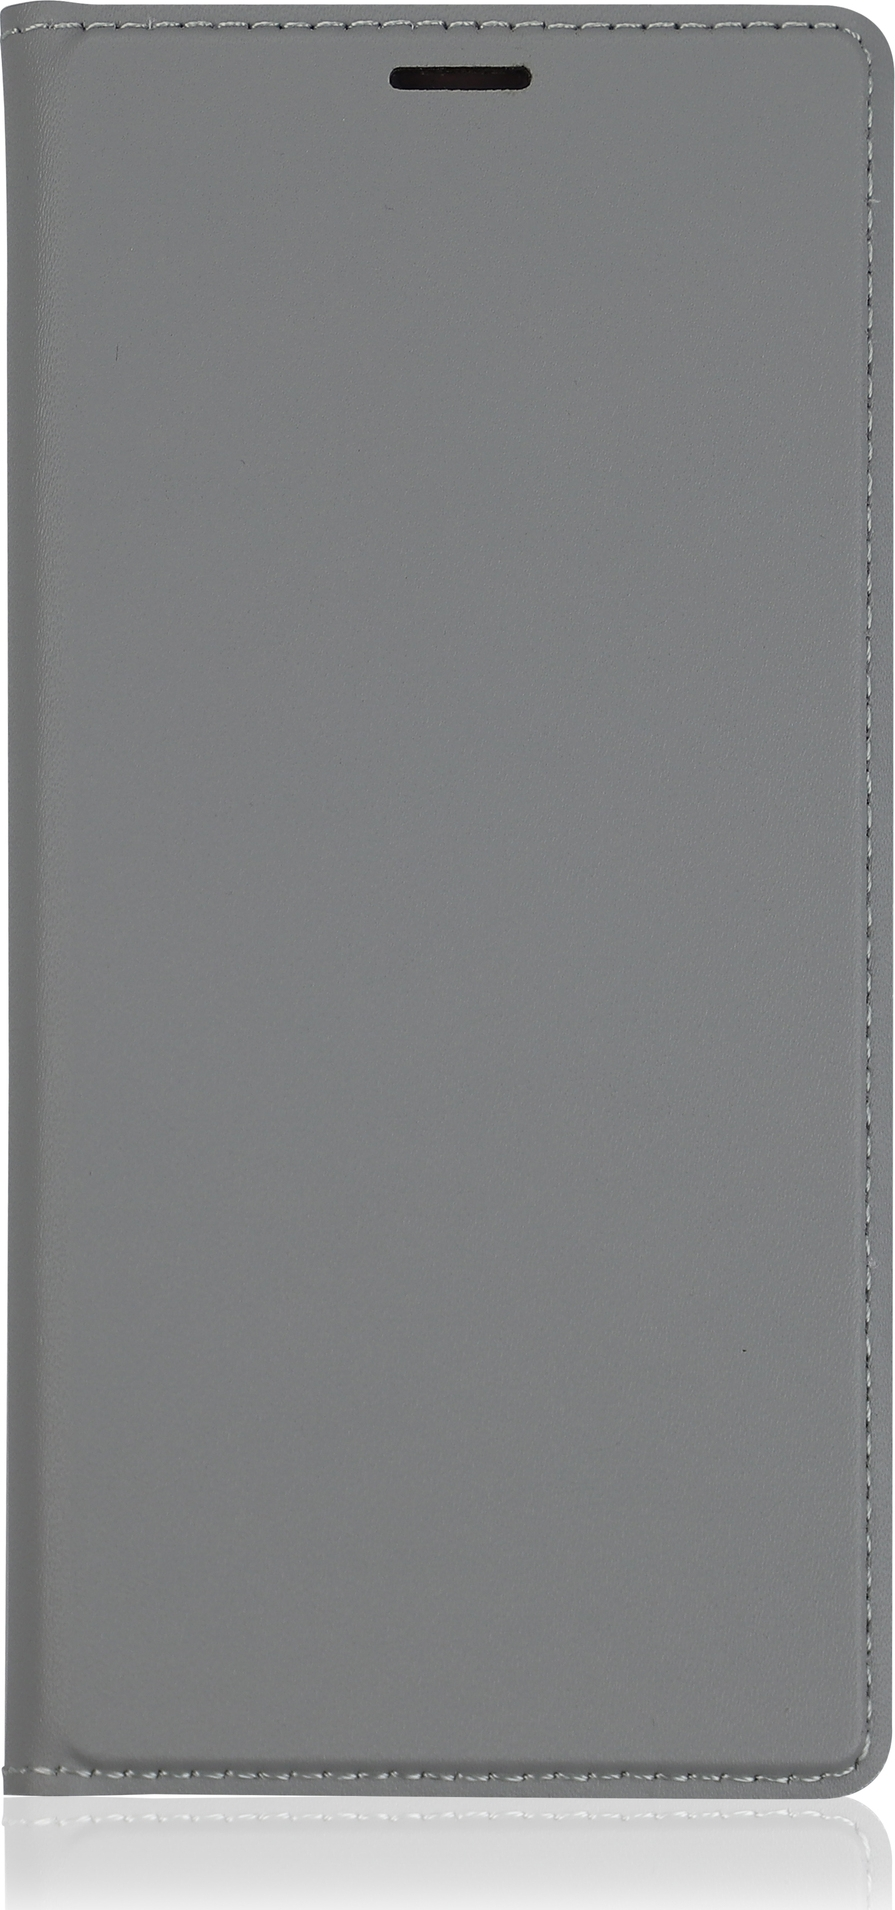 Чехол Brosco Book для Sony Xperia XZ2, серый чехол для сотового телефона brosco colourful для sony xz2 xz2 colourful green зеленый